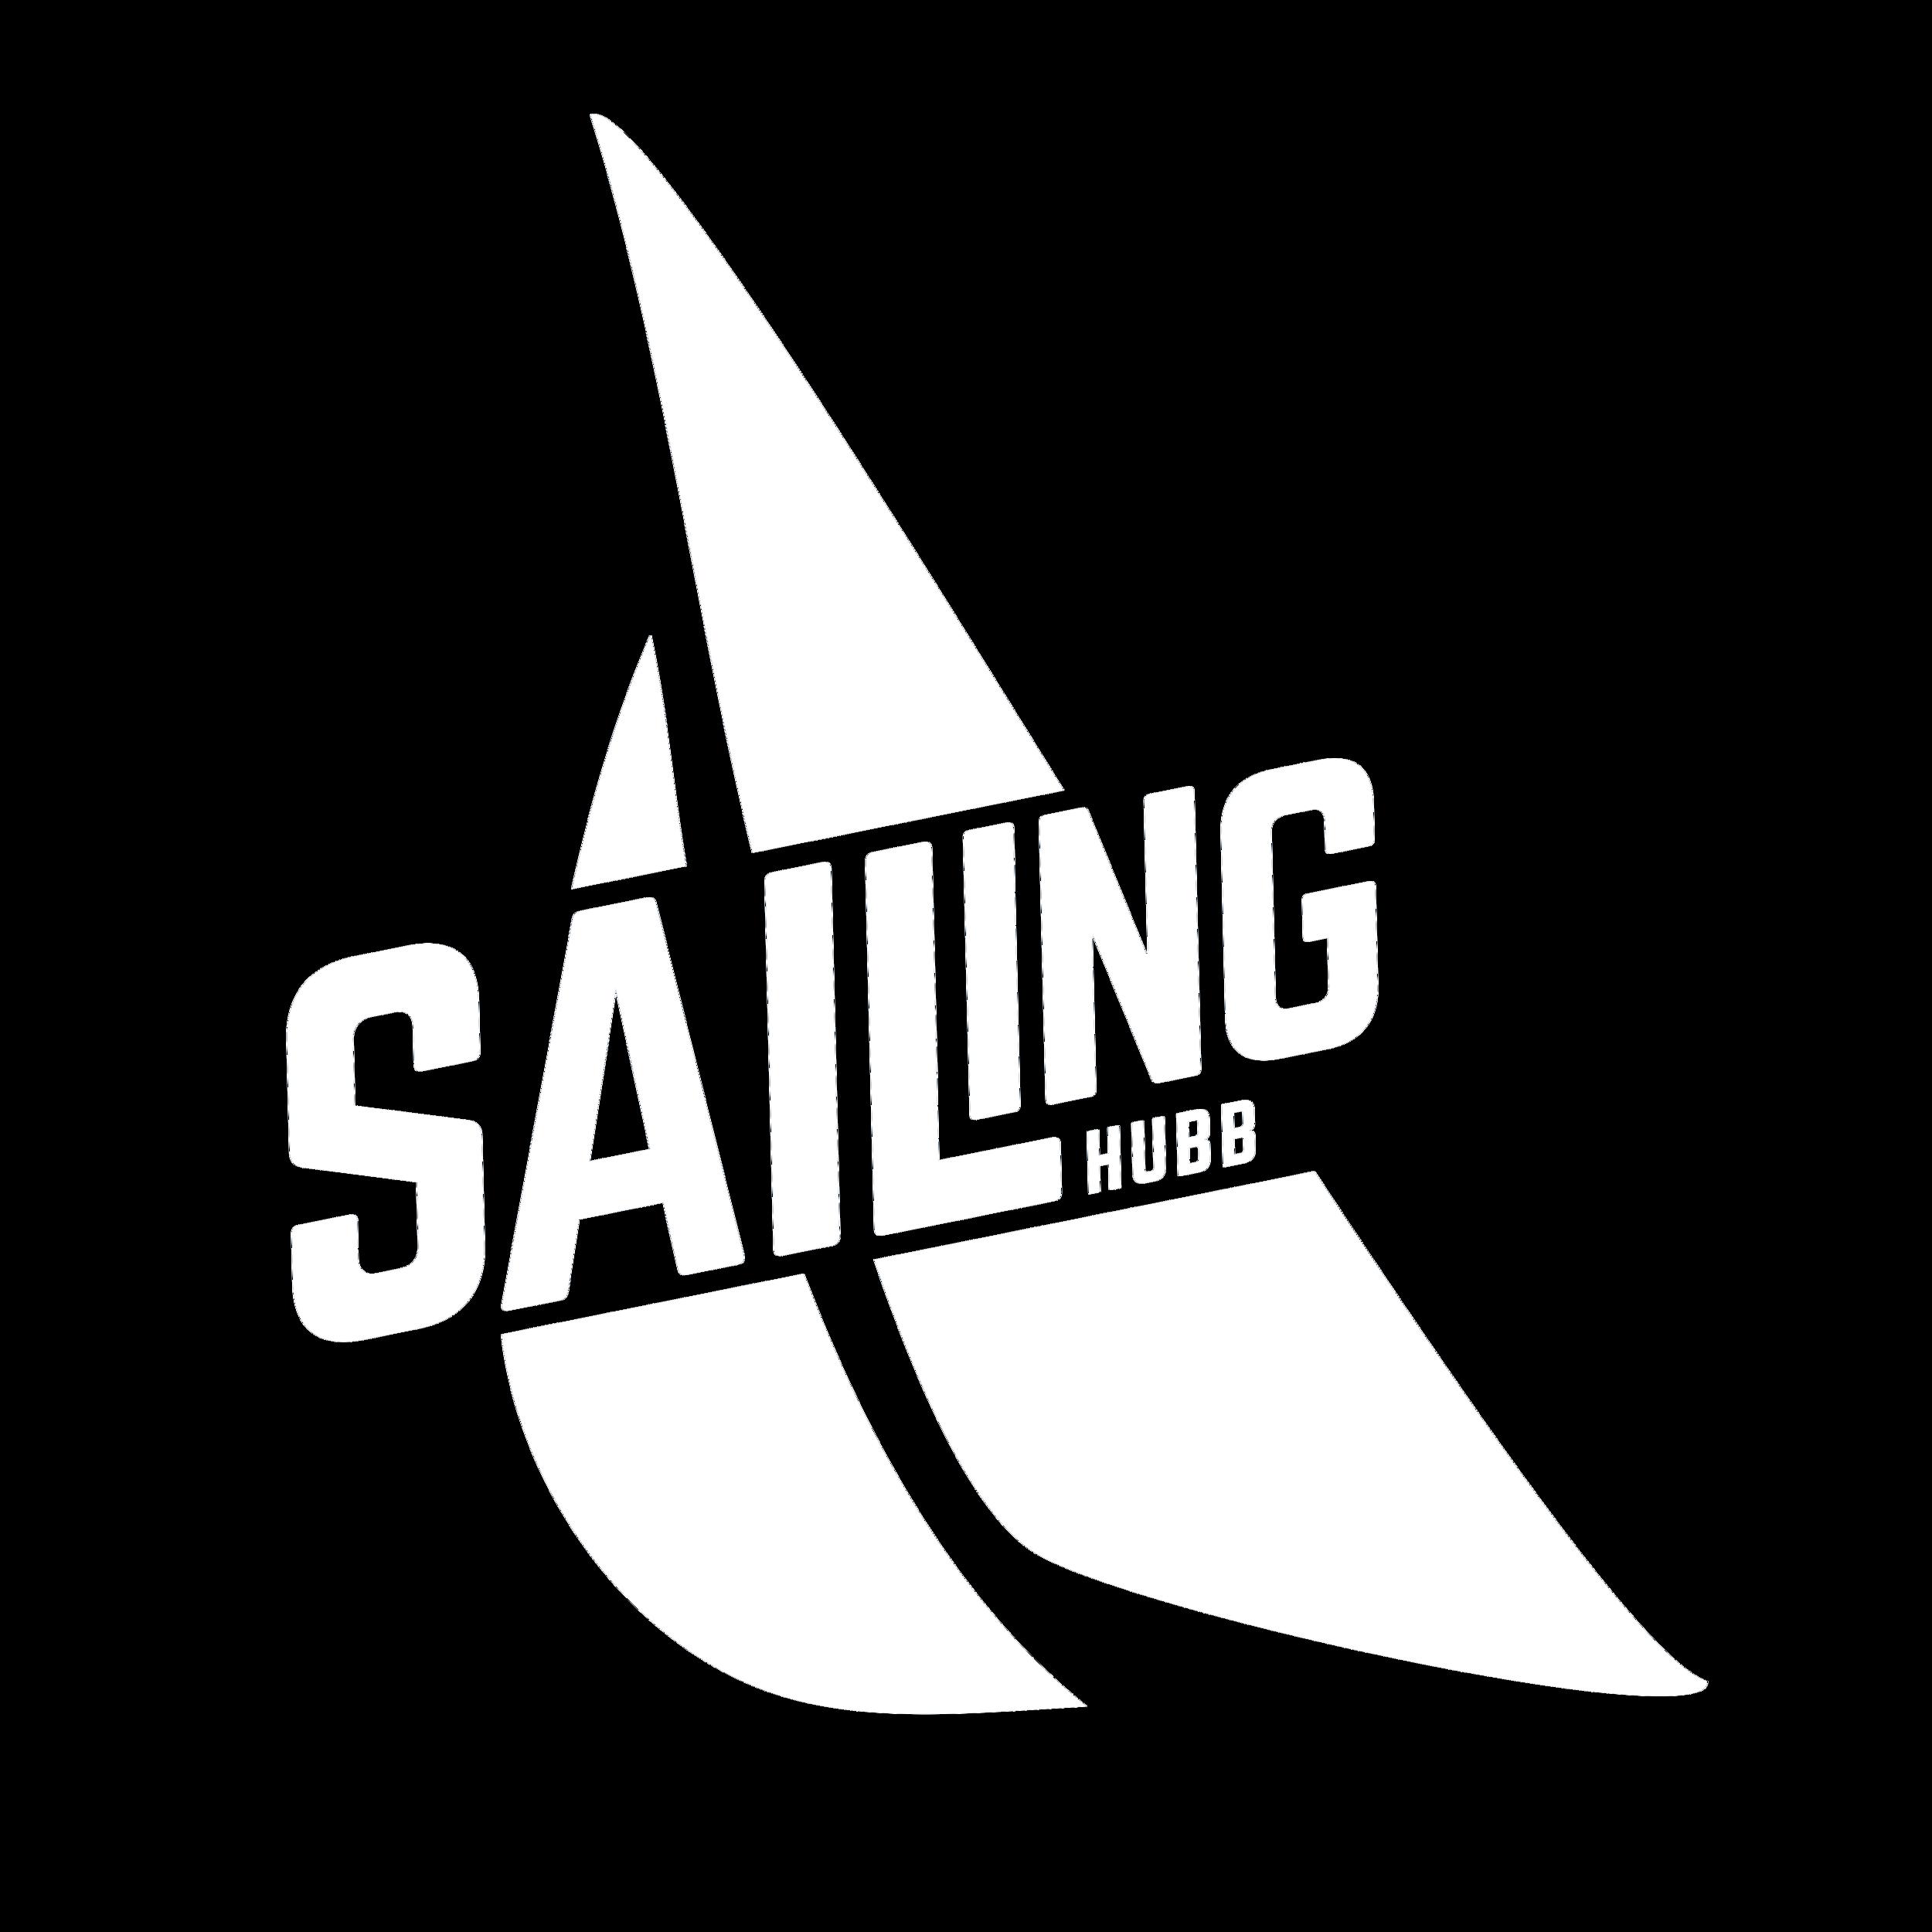 Sailinghubb-logo-square-final-white.png